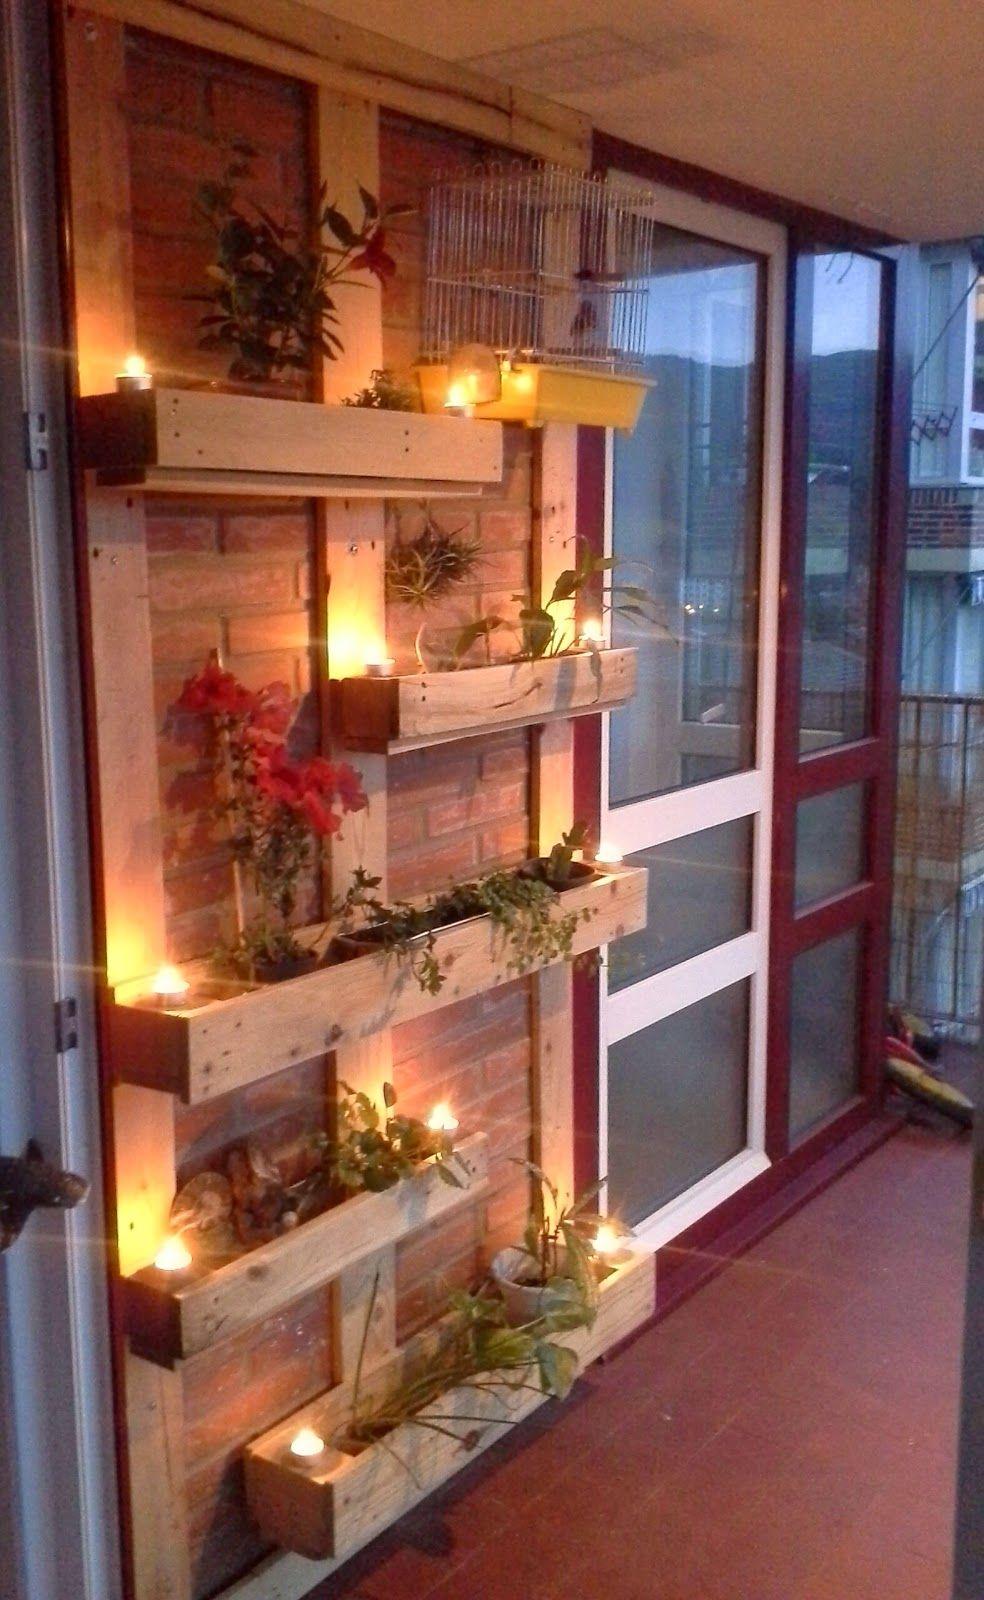 Photo of 50 Best Balcony Garden Ideas and Designs for 2019, 50 best balcony gan as and de…